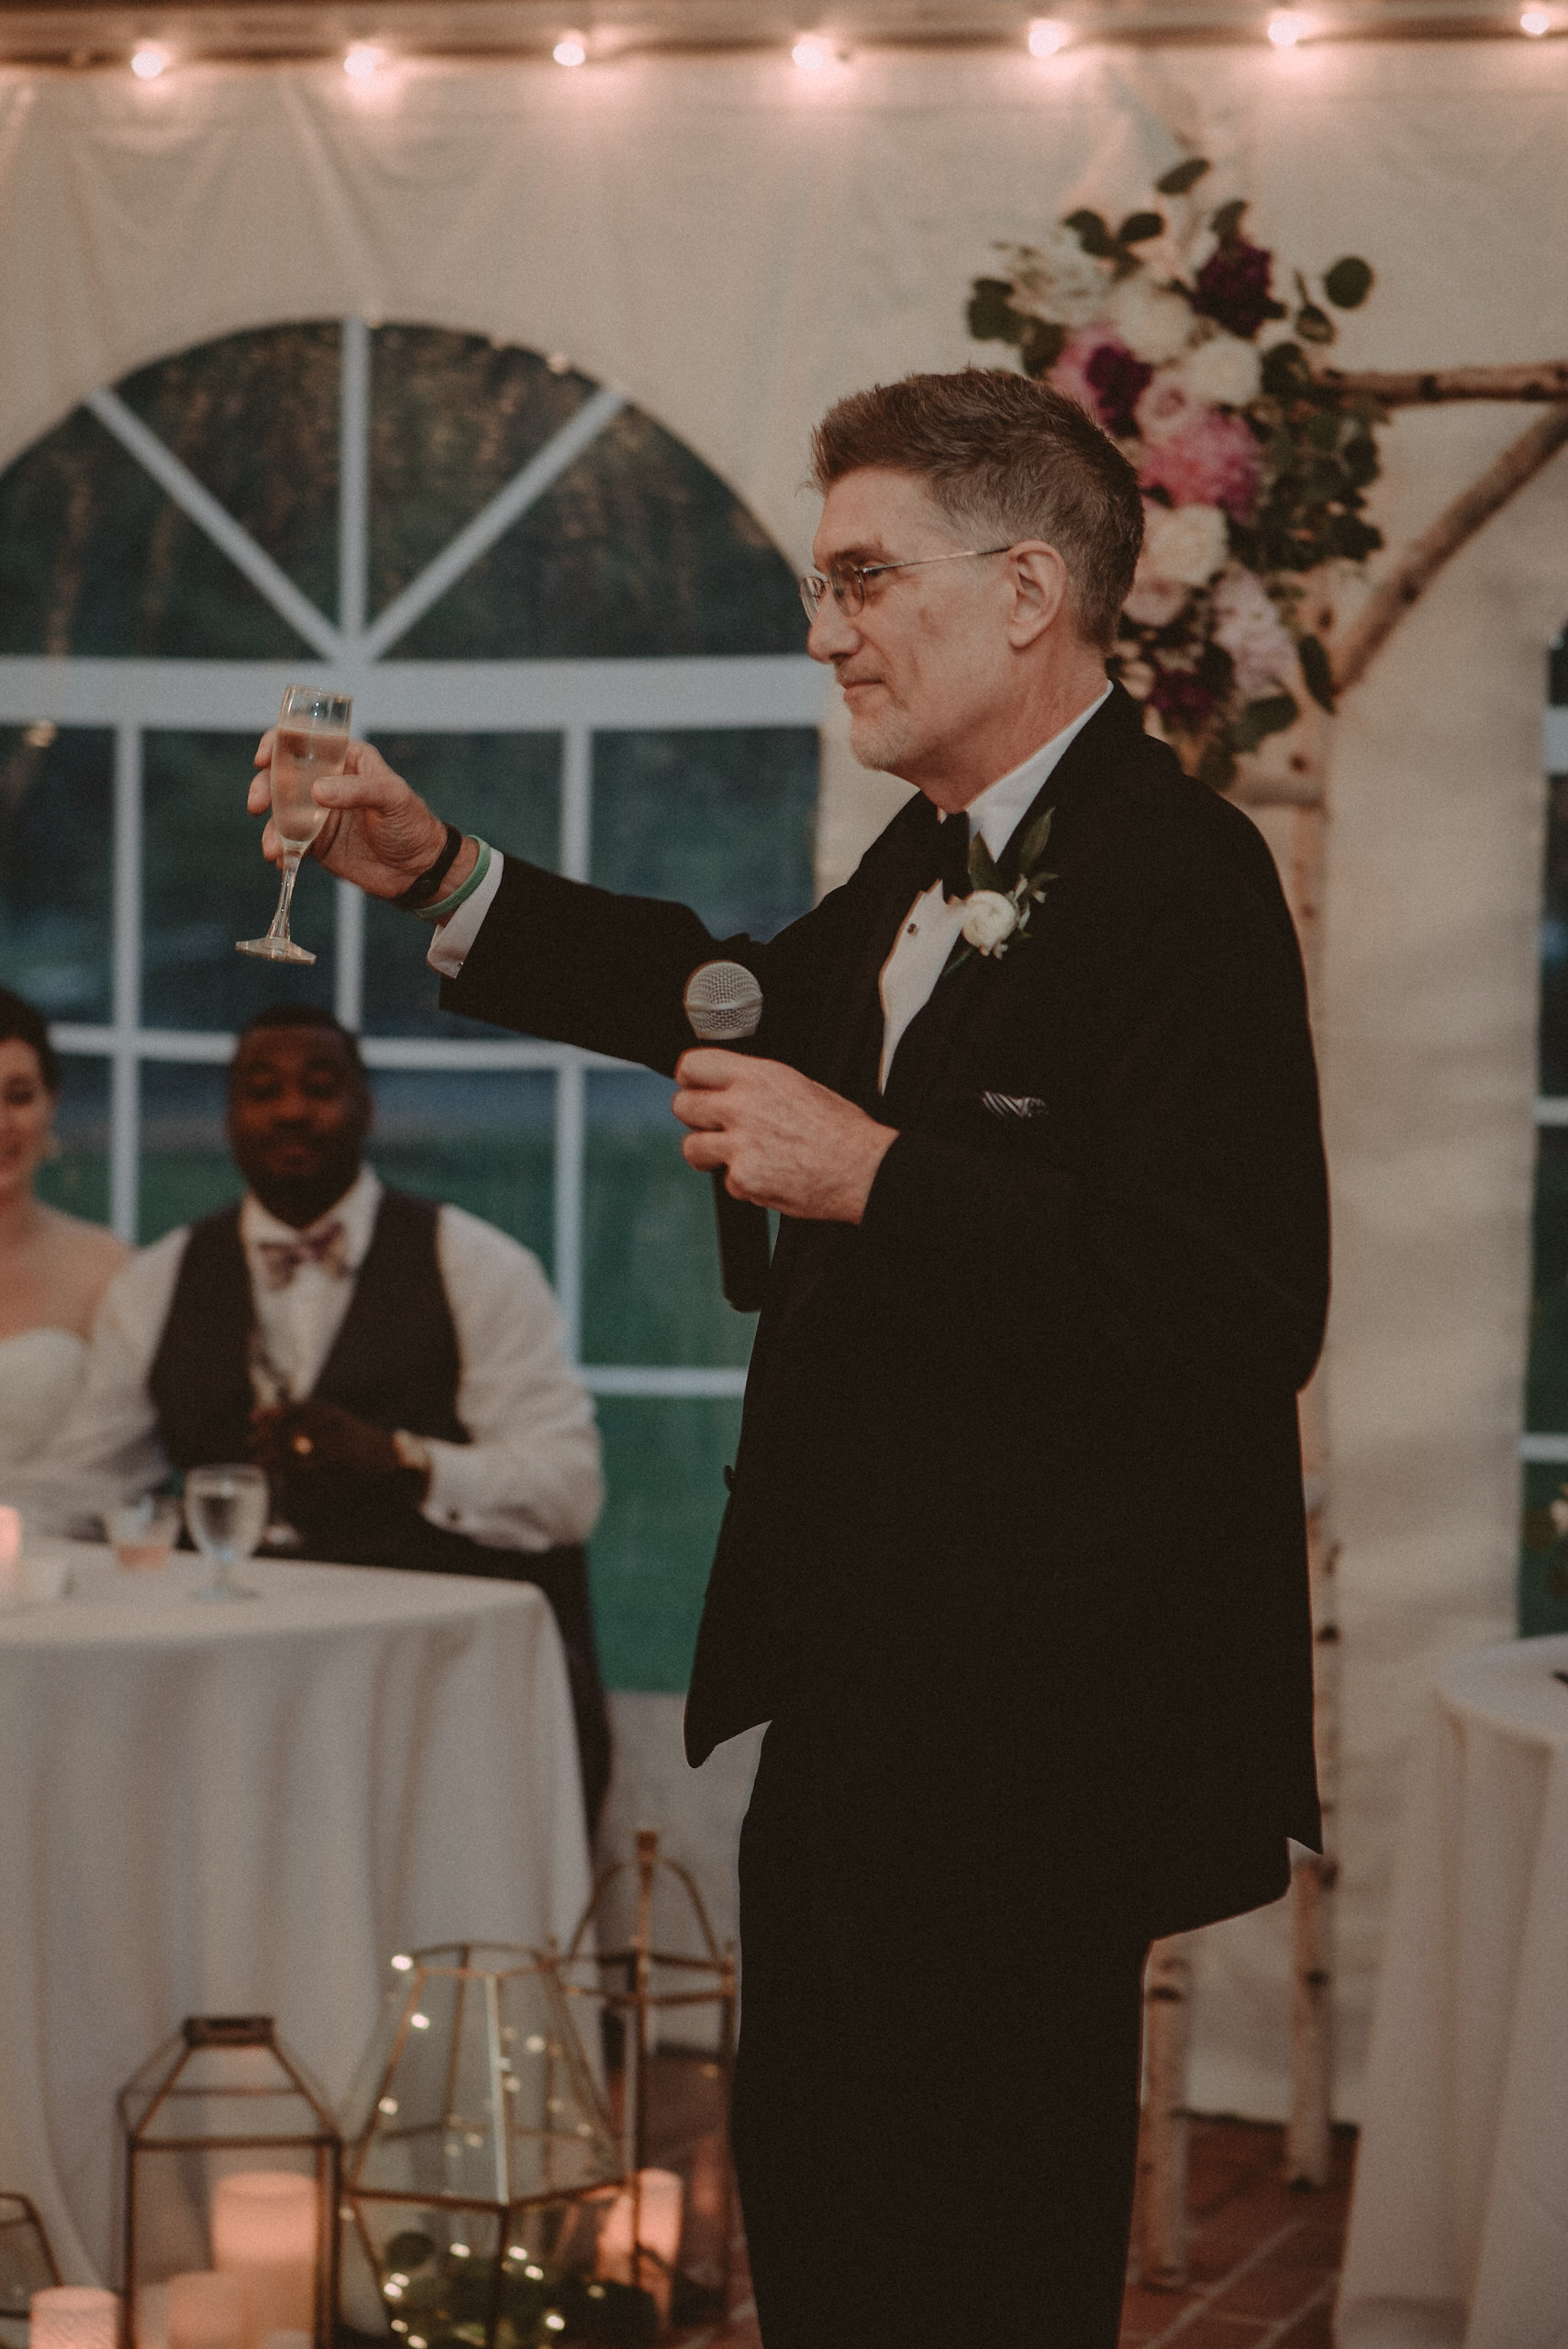 Father making speech at wedding